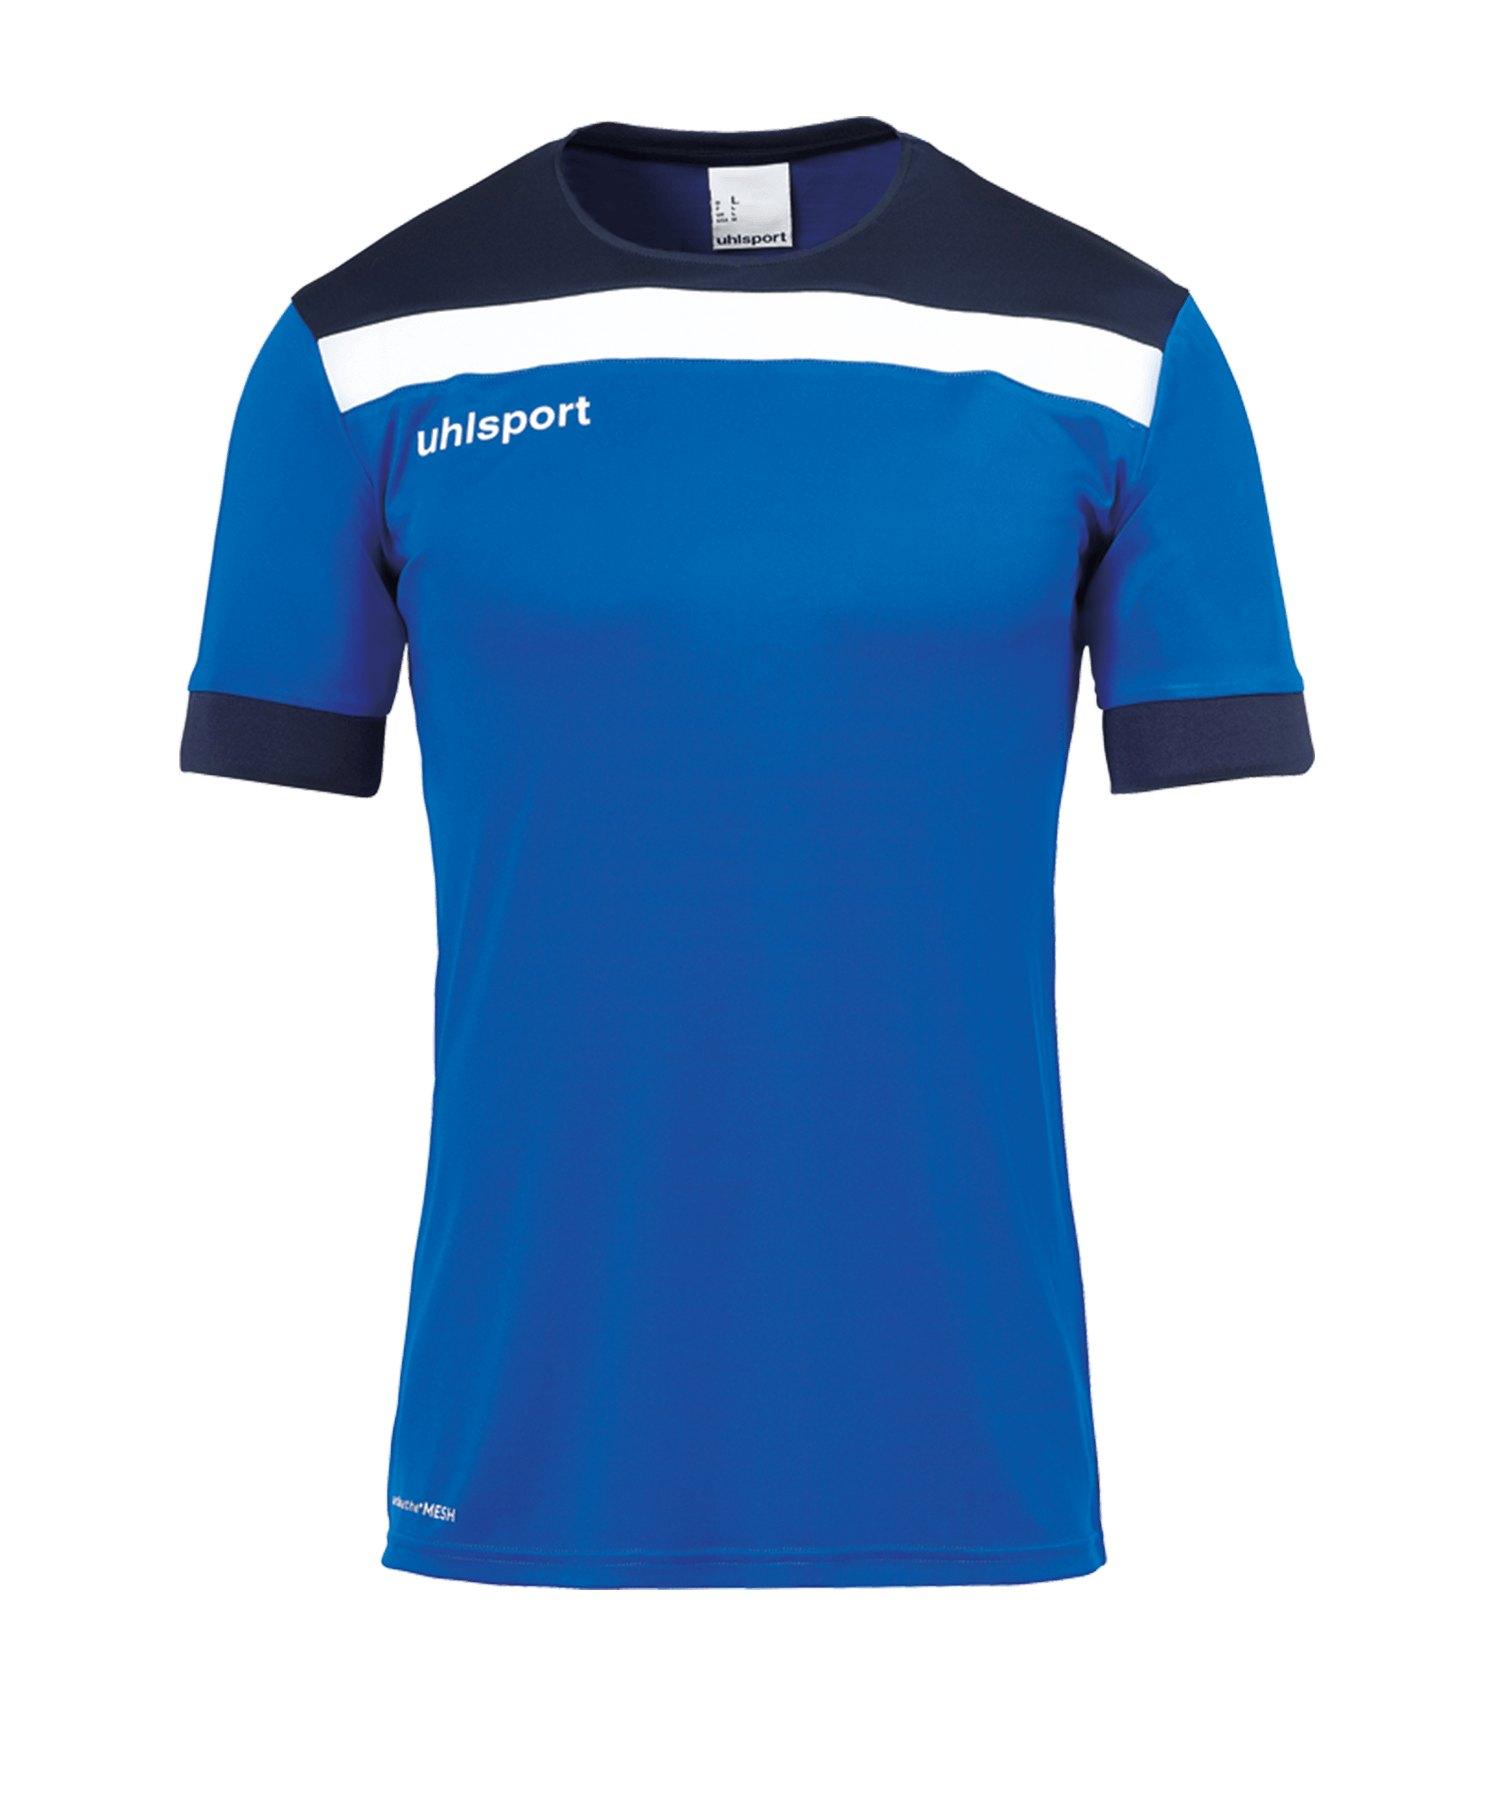 Uhlsport Offense 23 Trikot kurzarm Blau F03 - blau